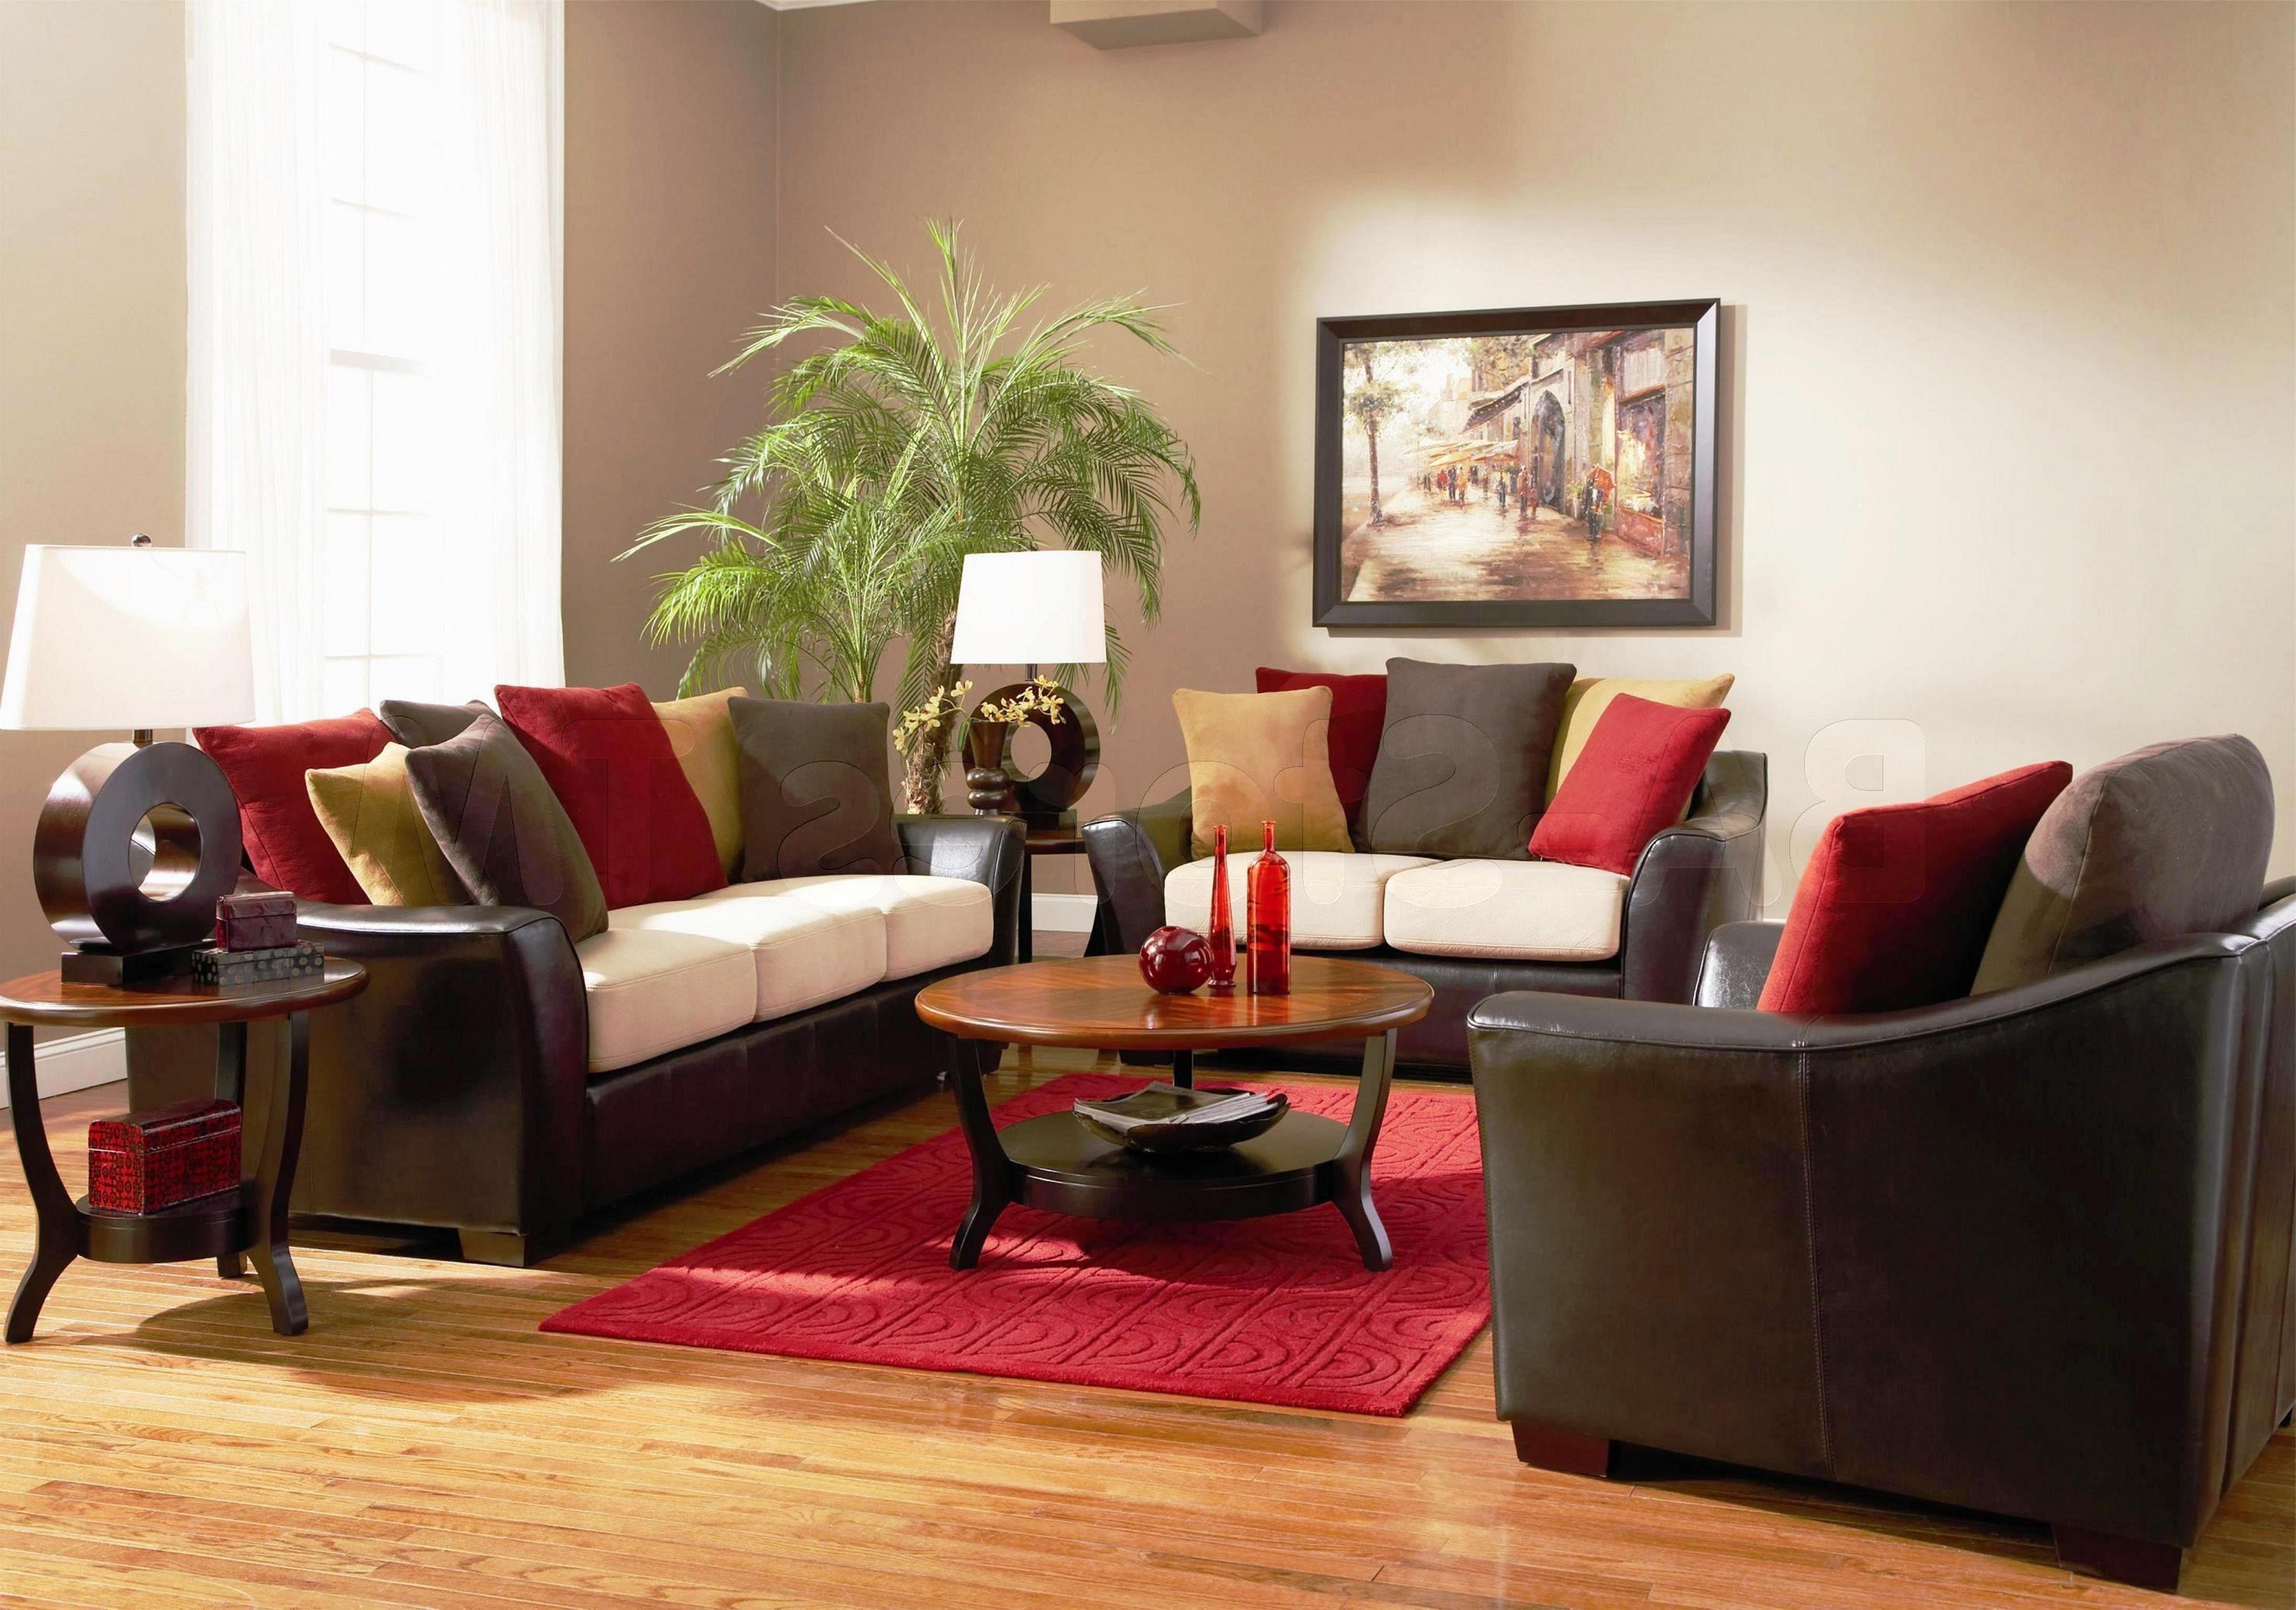 Marvelous 25 Amazing Sofa Design For Modern Living Room Decoration Ideas Https D Brown Living Room Decor Brown Furniture Living Room Brown Couch Living Room